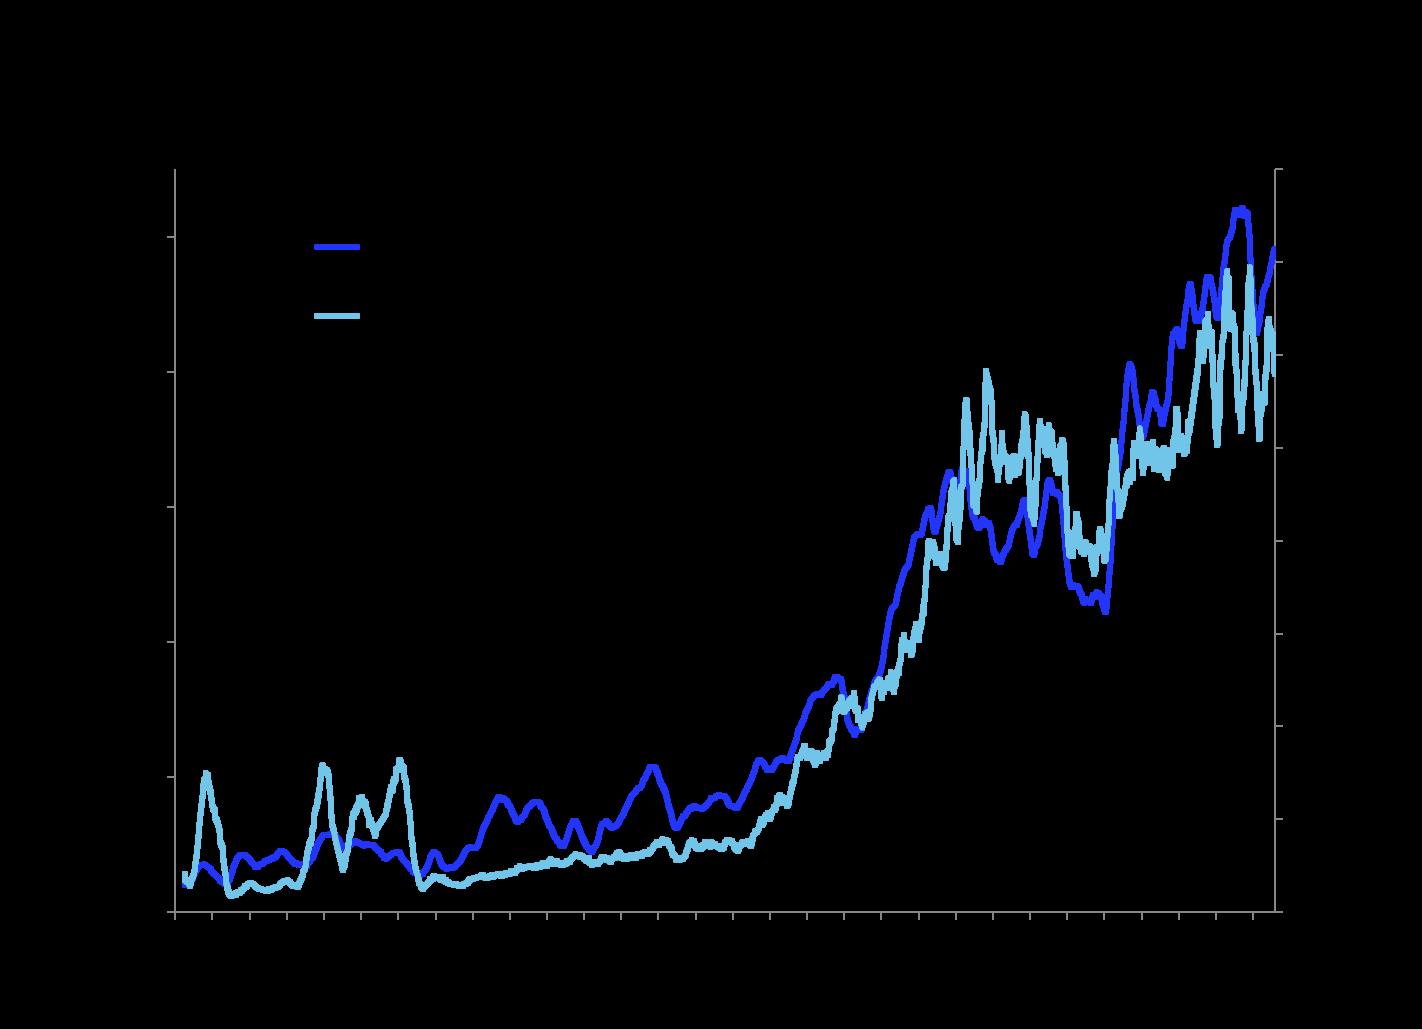 ICE Low Sulphur Gasoil